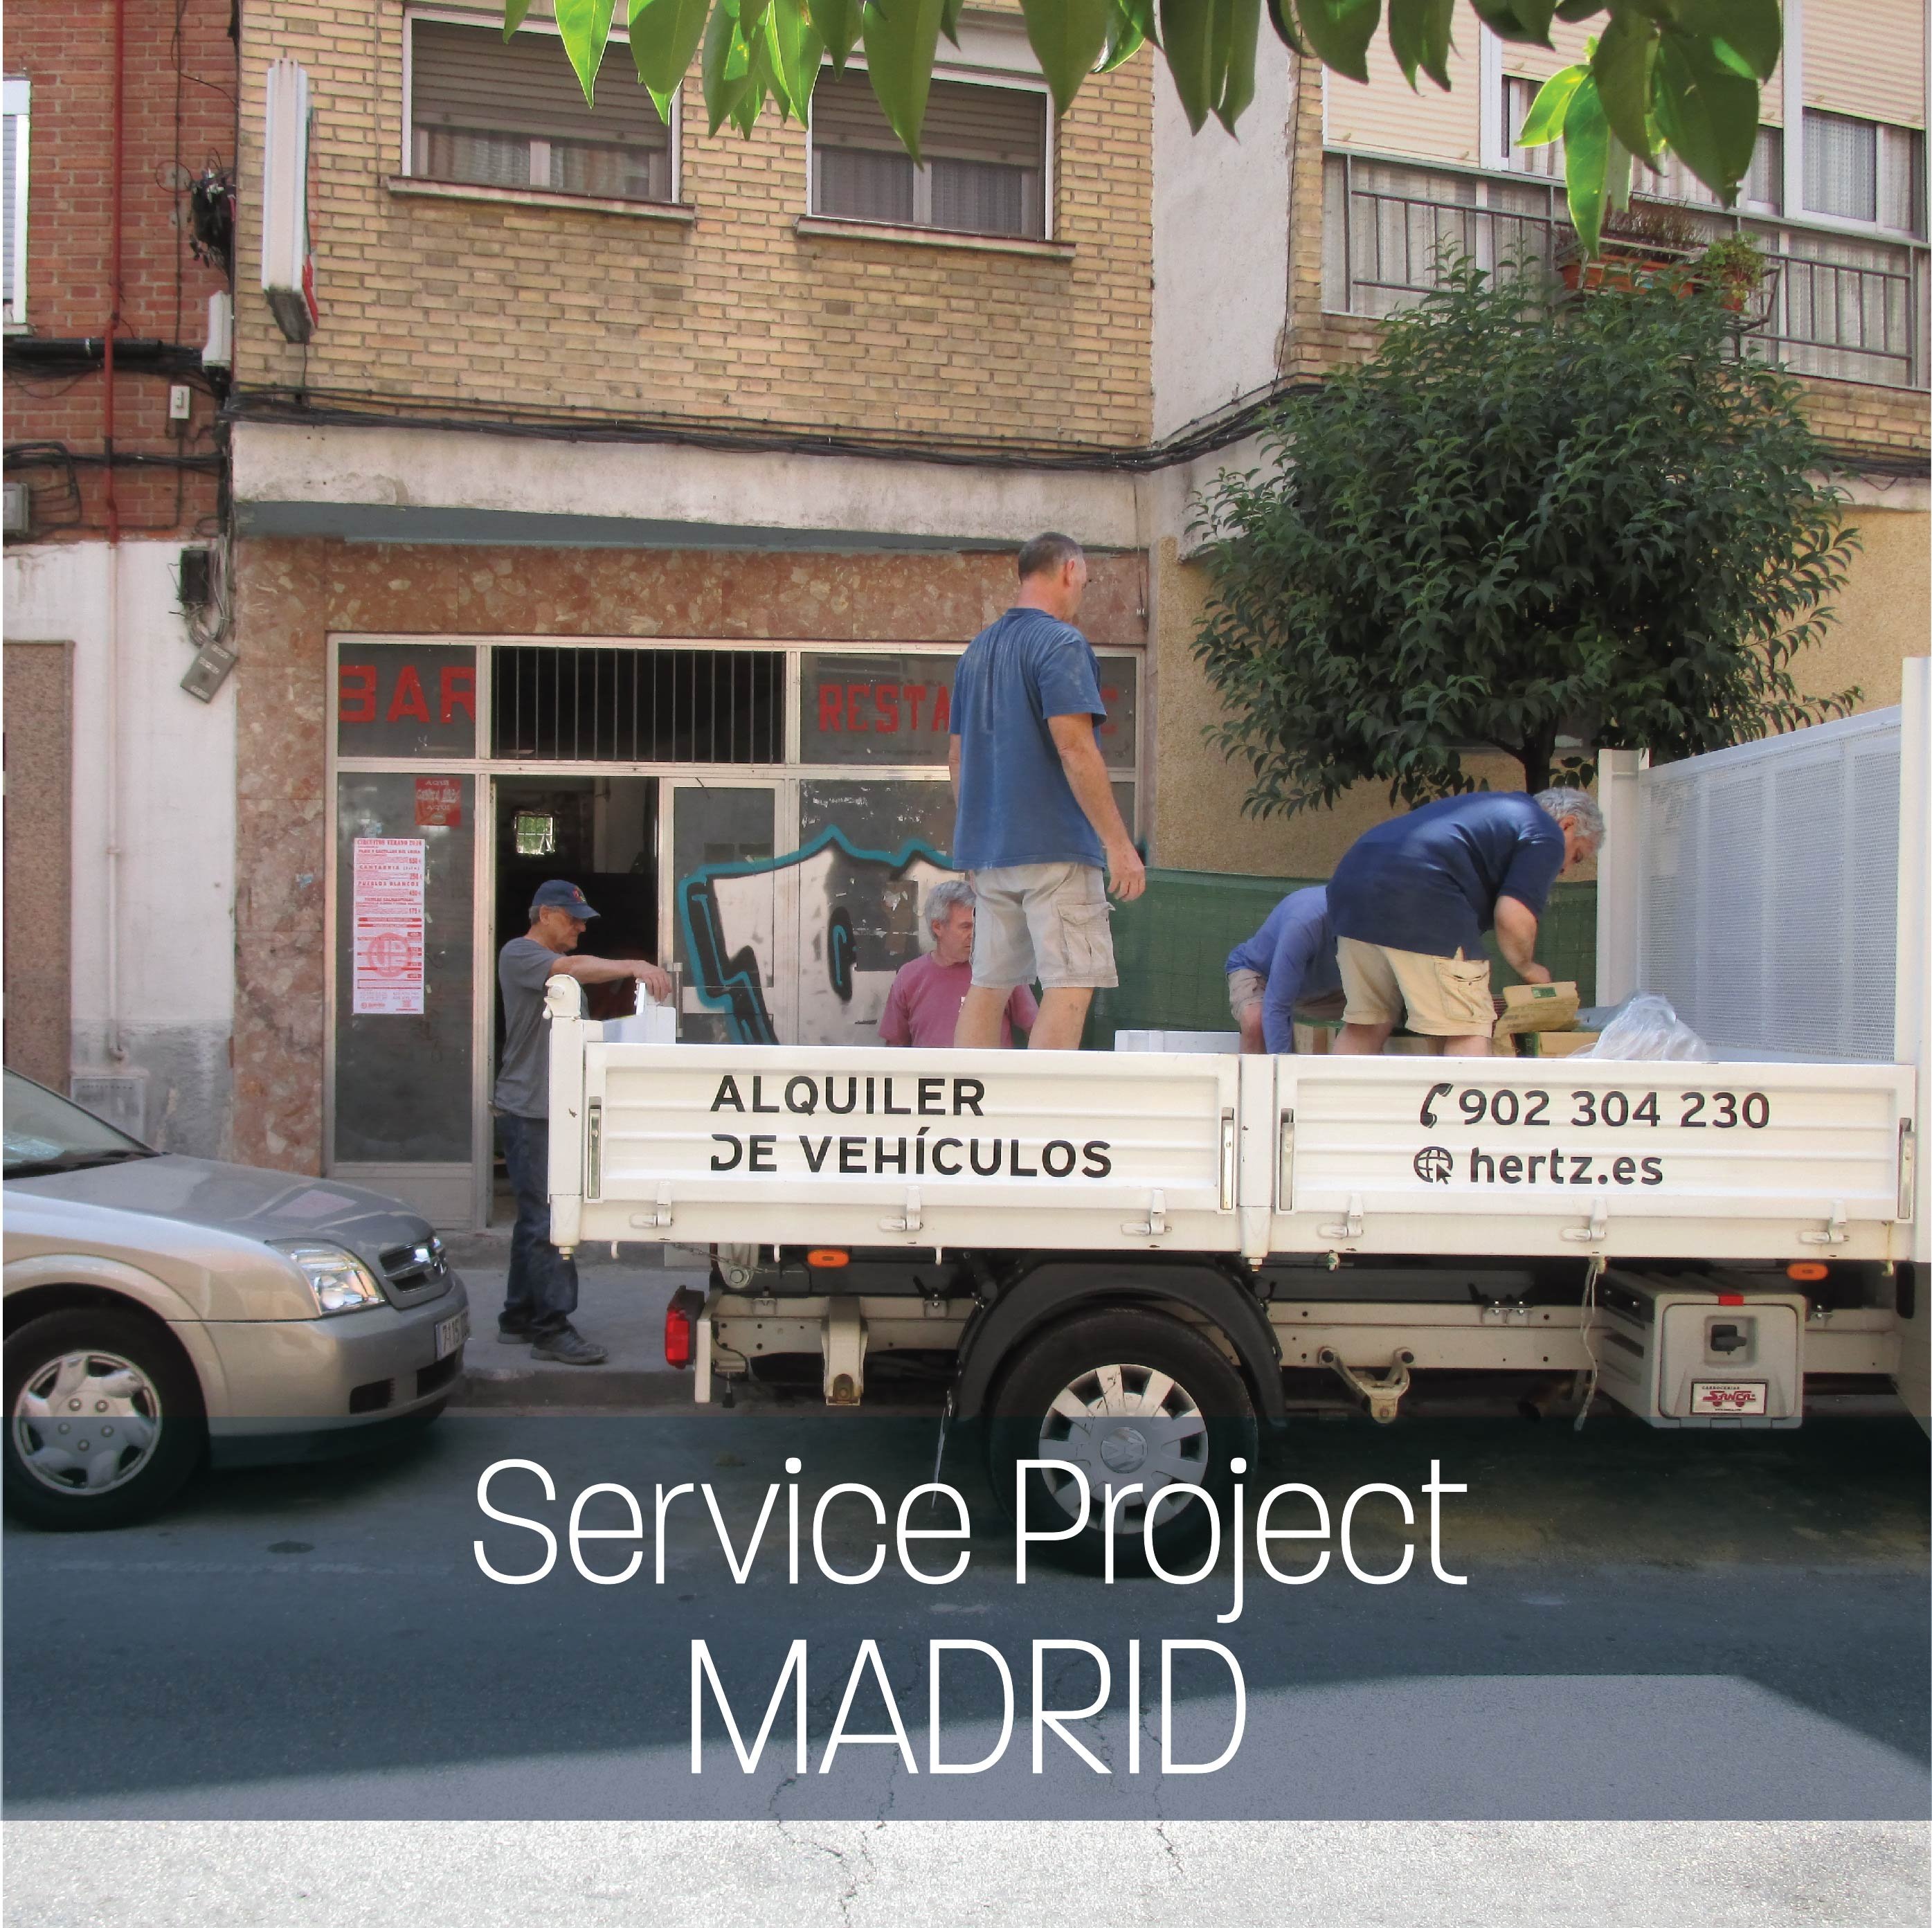 Service Project: Madrid